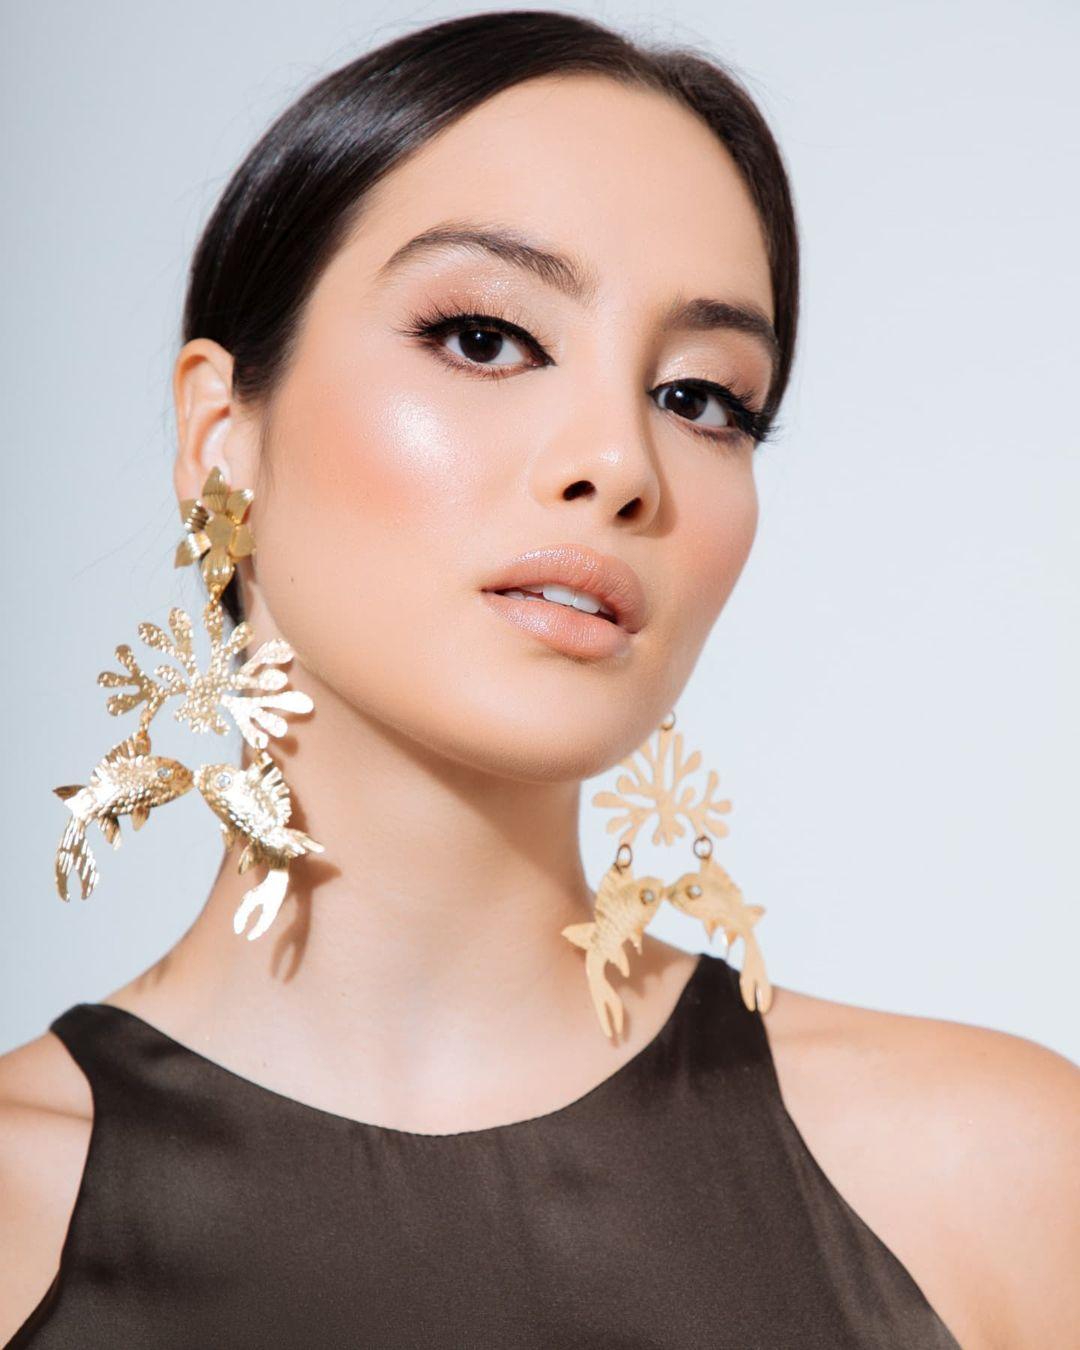 maria alejandra vengoechea, miss colombia hispanoamericana 2021/3rd runner-up de miss international 2019. - Página 14 23480211